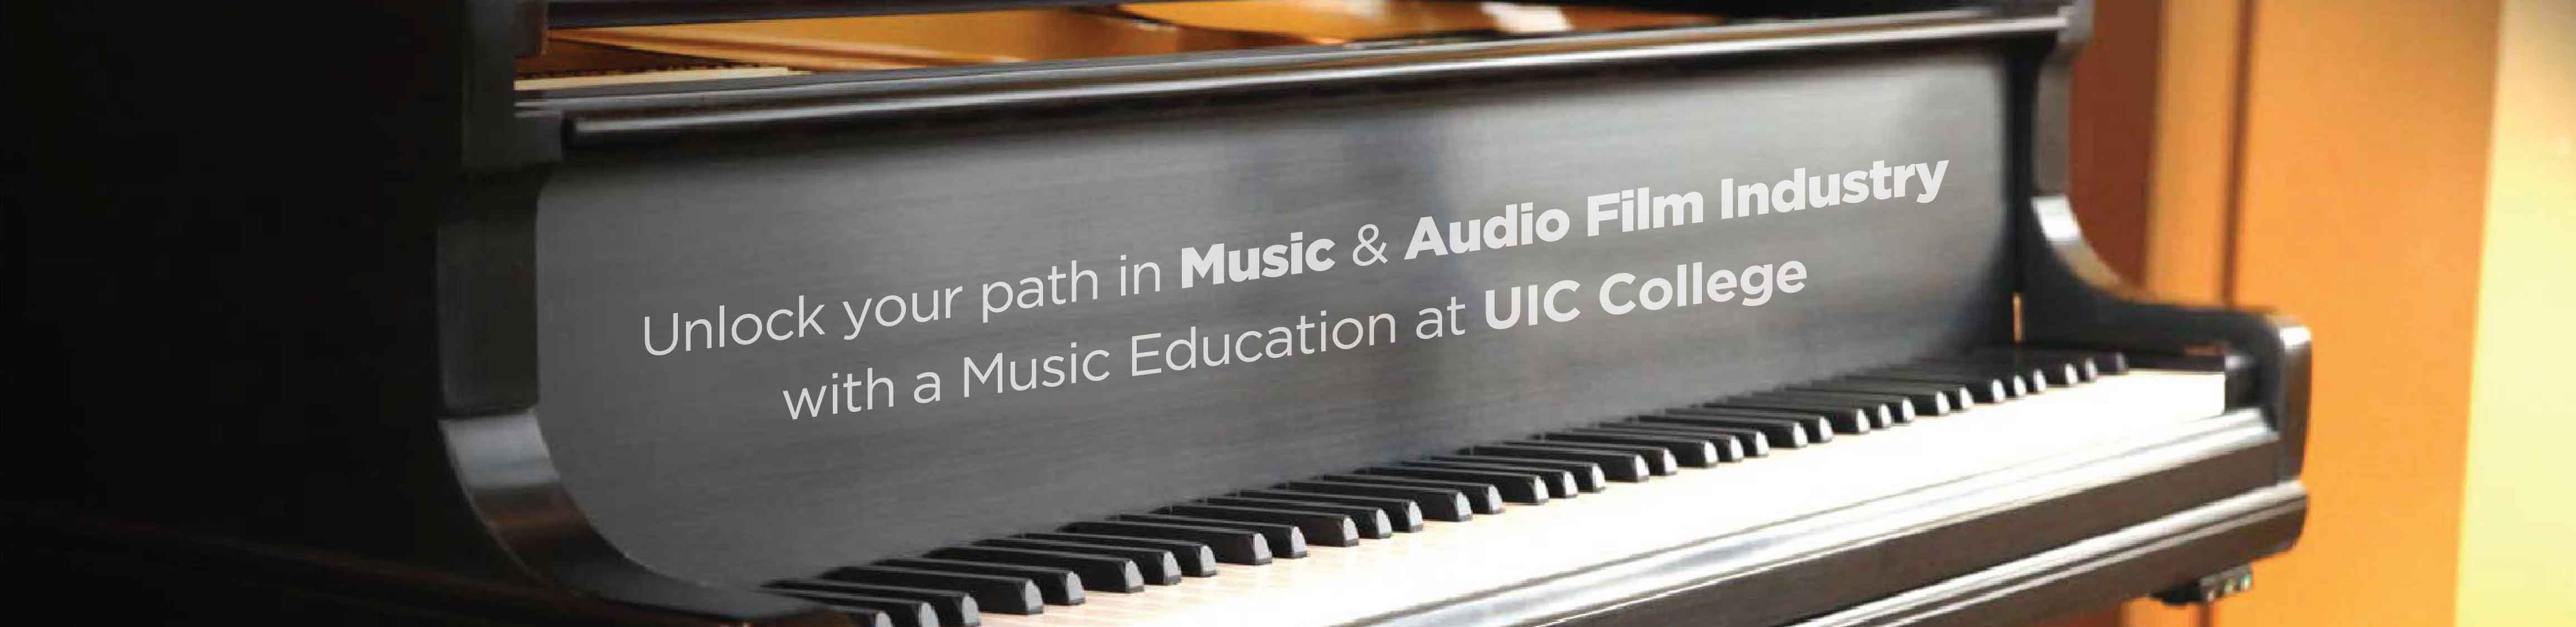 UIC-Music-Web-Banner-01